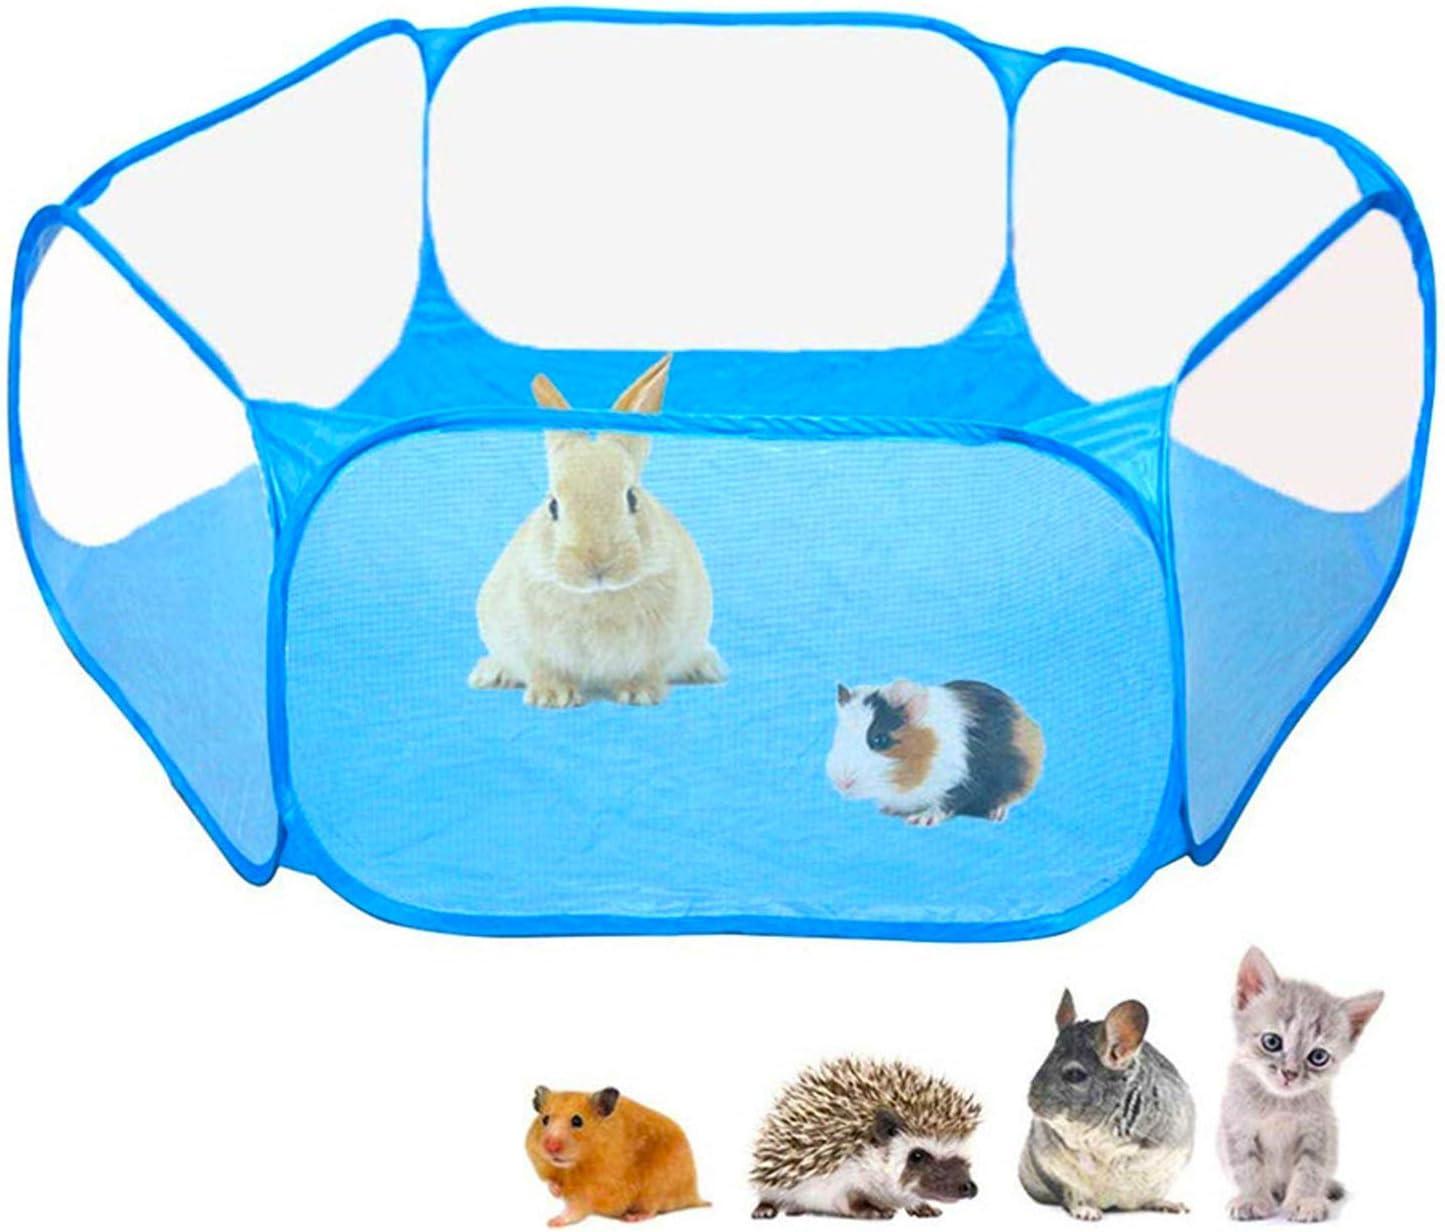 Macllar Corralito Plegable para Mascotas Interior al Aire Libre, Jaula de corralito de Animales Conejillo de Indias, hámster, Conejo, Rata, cerditos Correr portátil (Azul)